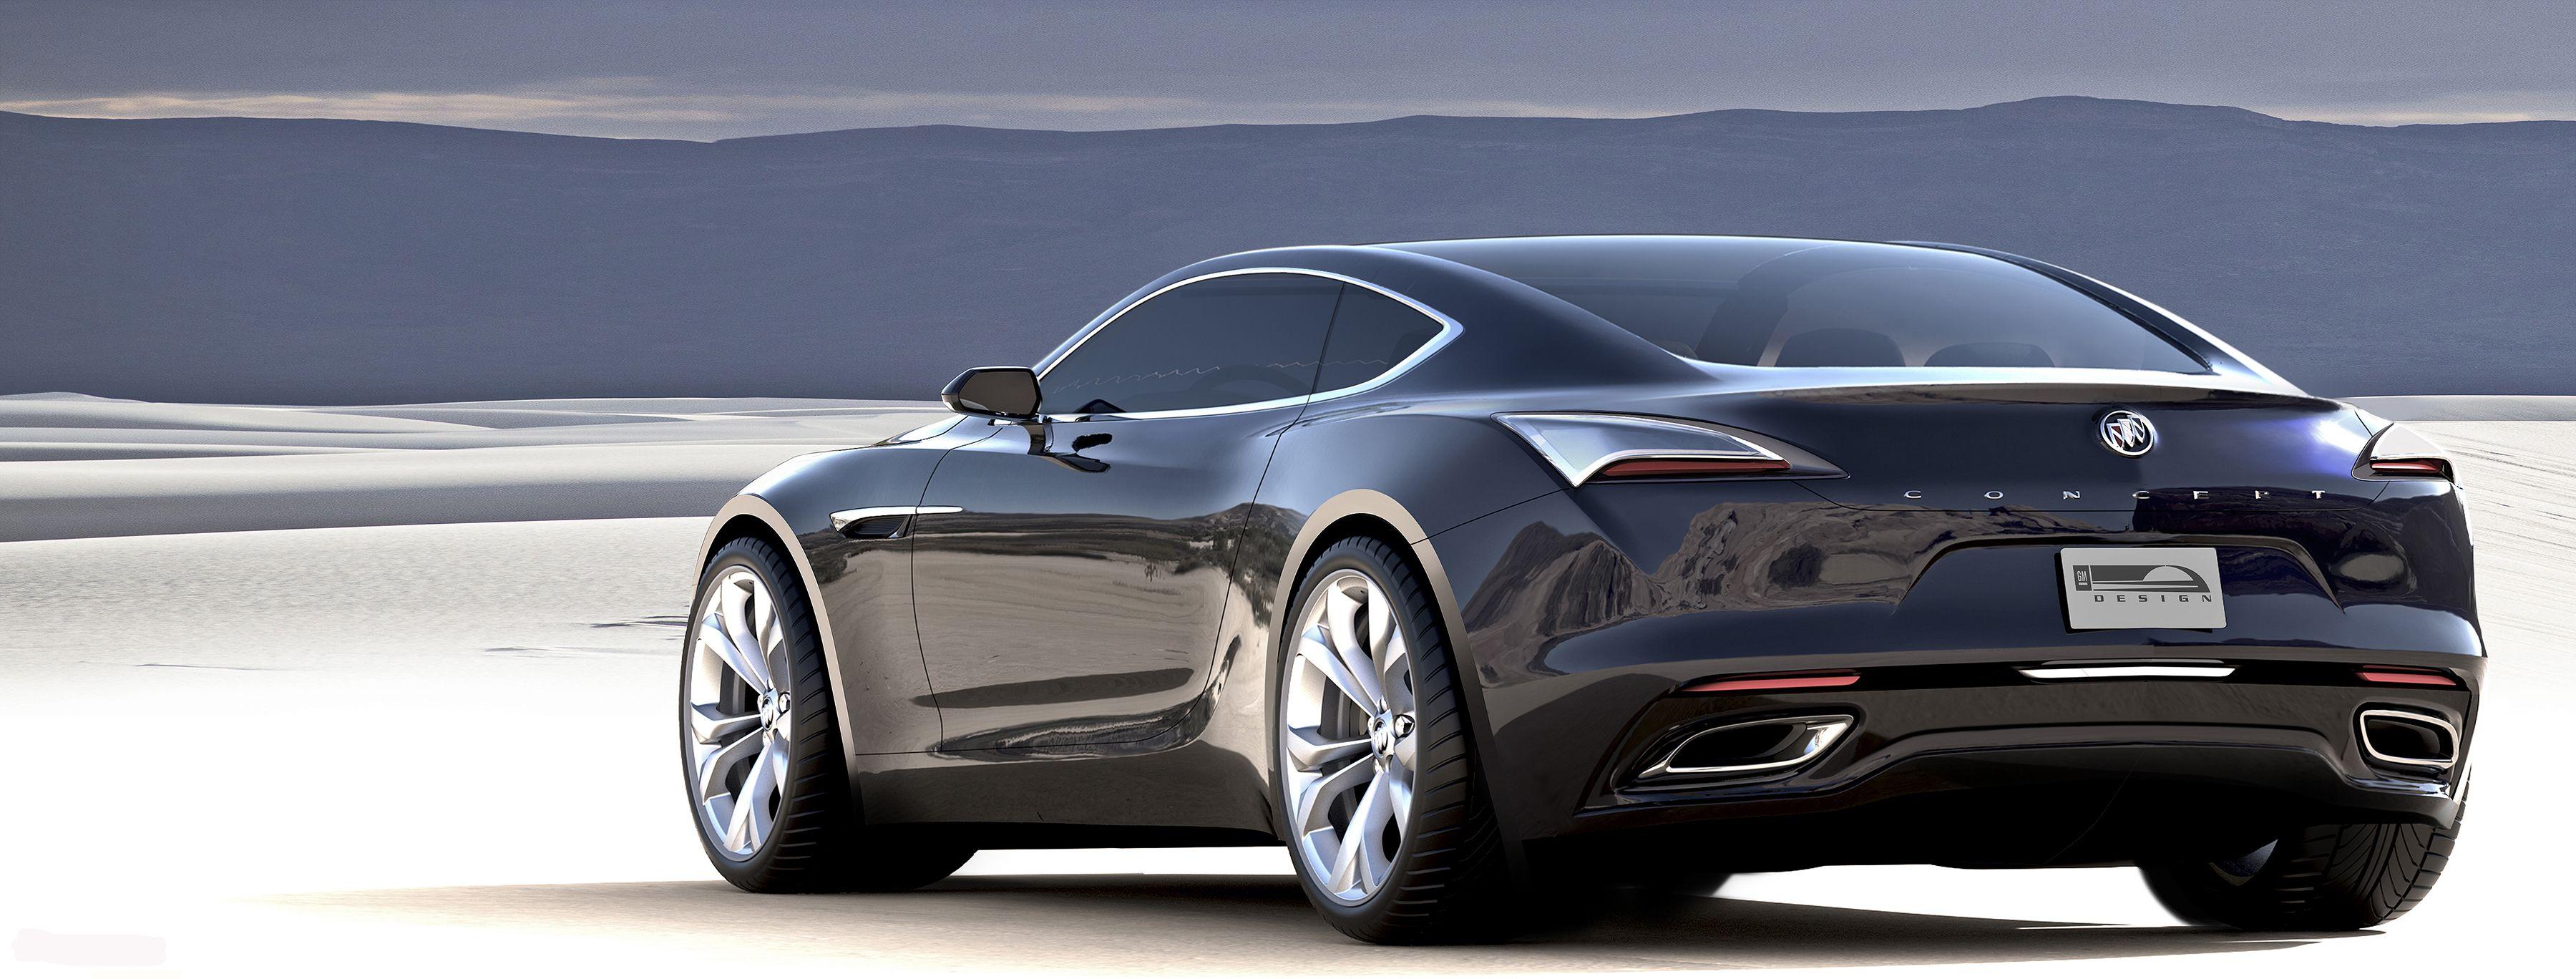 Buick Avista Coupe Concept De Motor Cadillac Twin Turbo